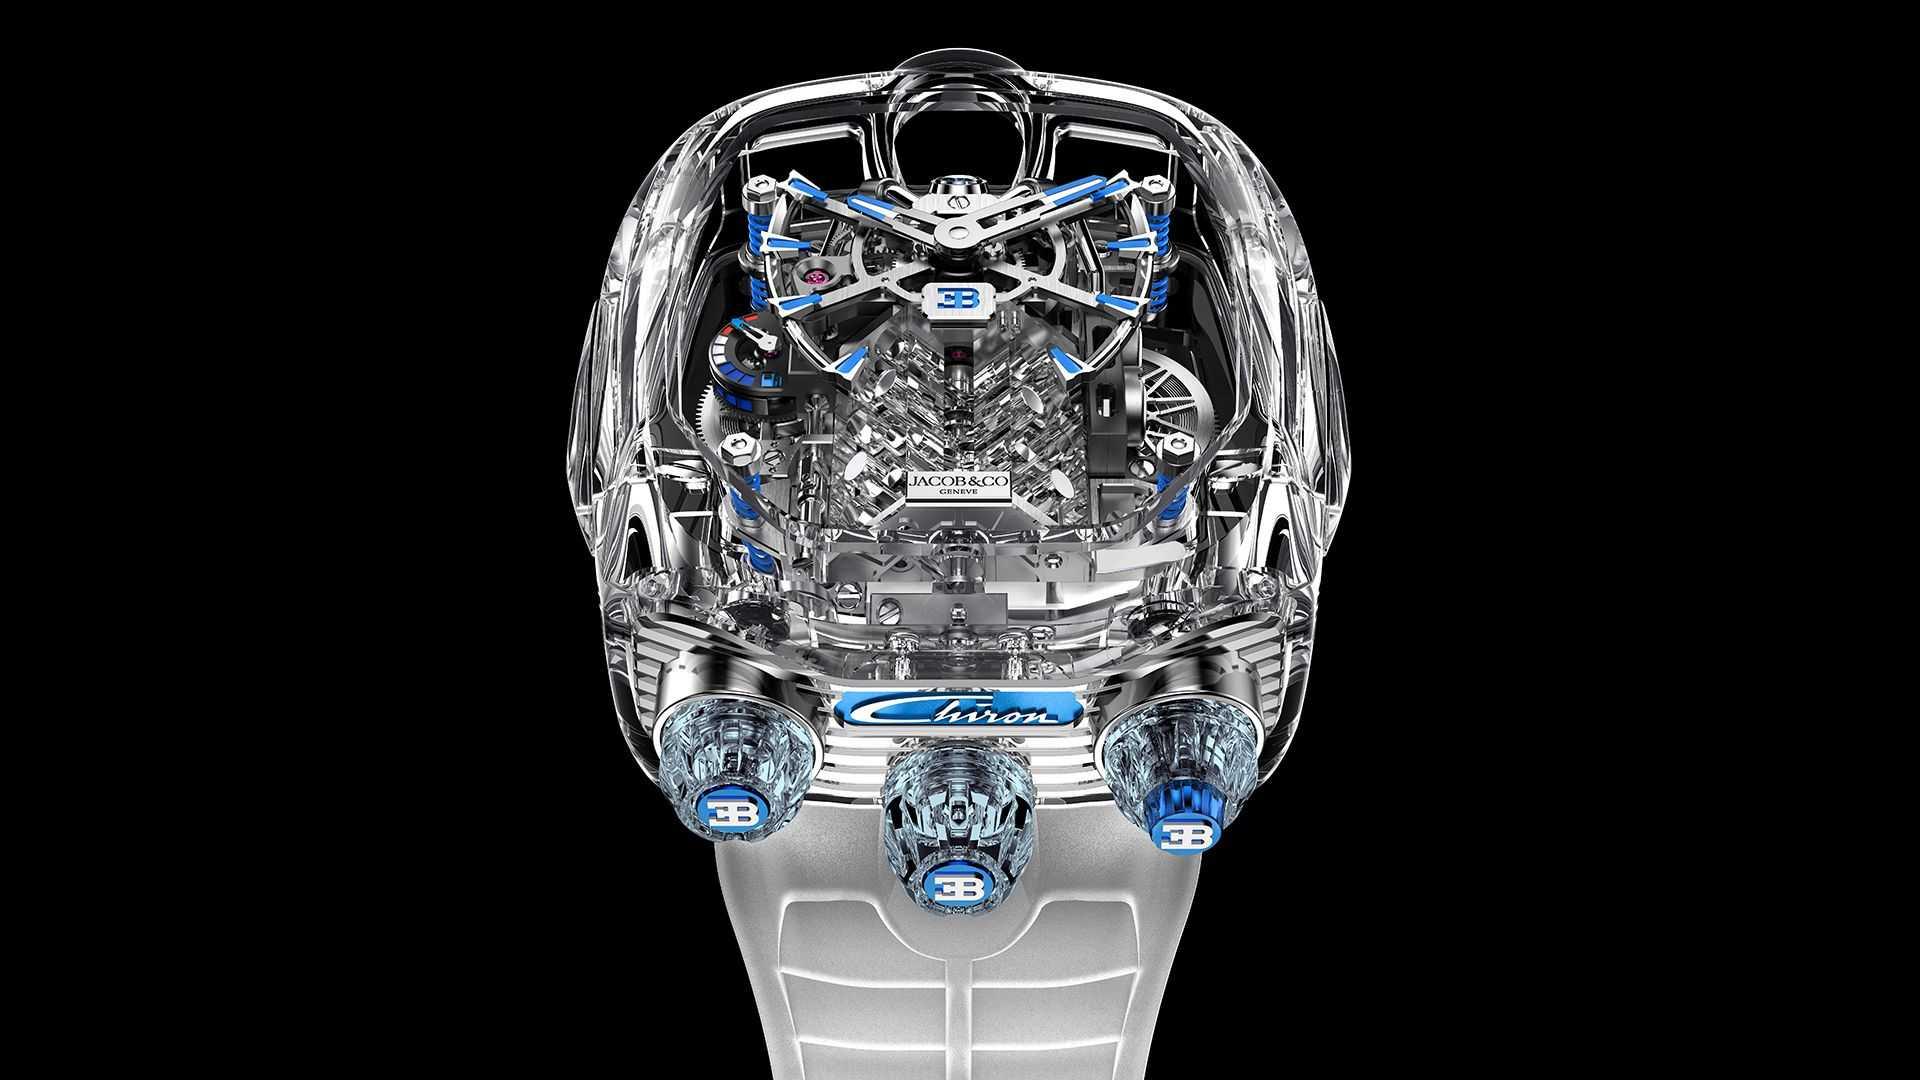 Jacob-Co-Bugatti-Chiron-Tourbillon-Watch-2